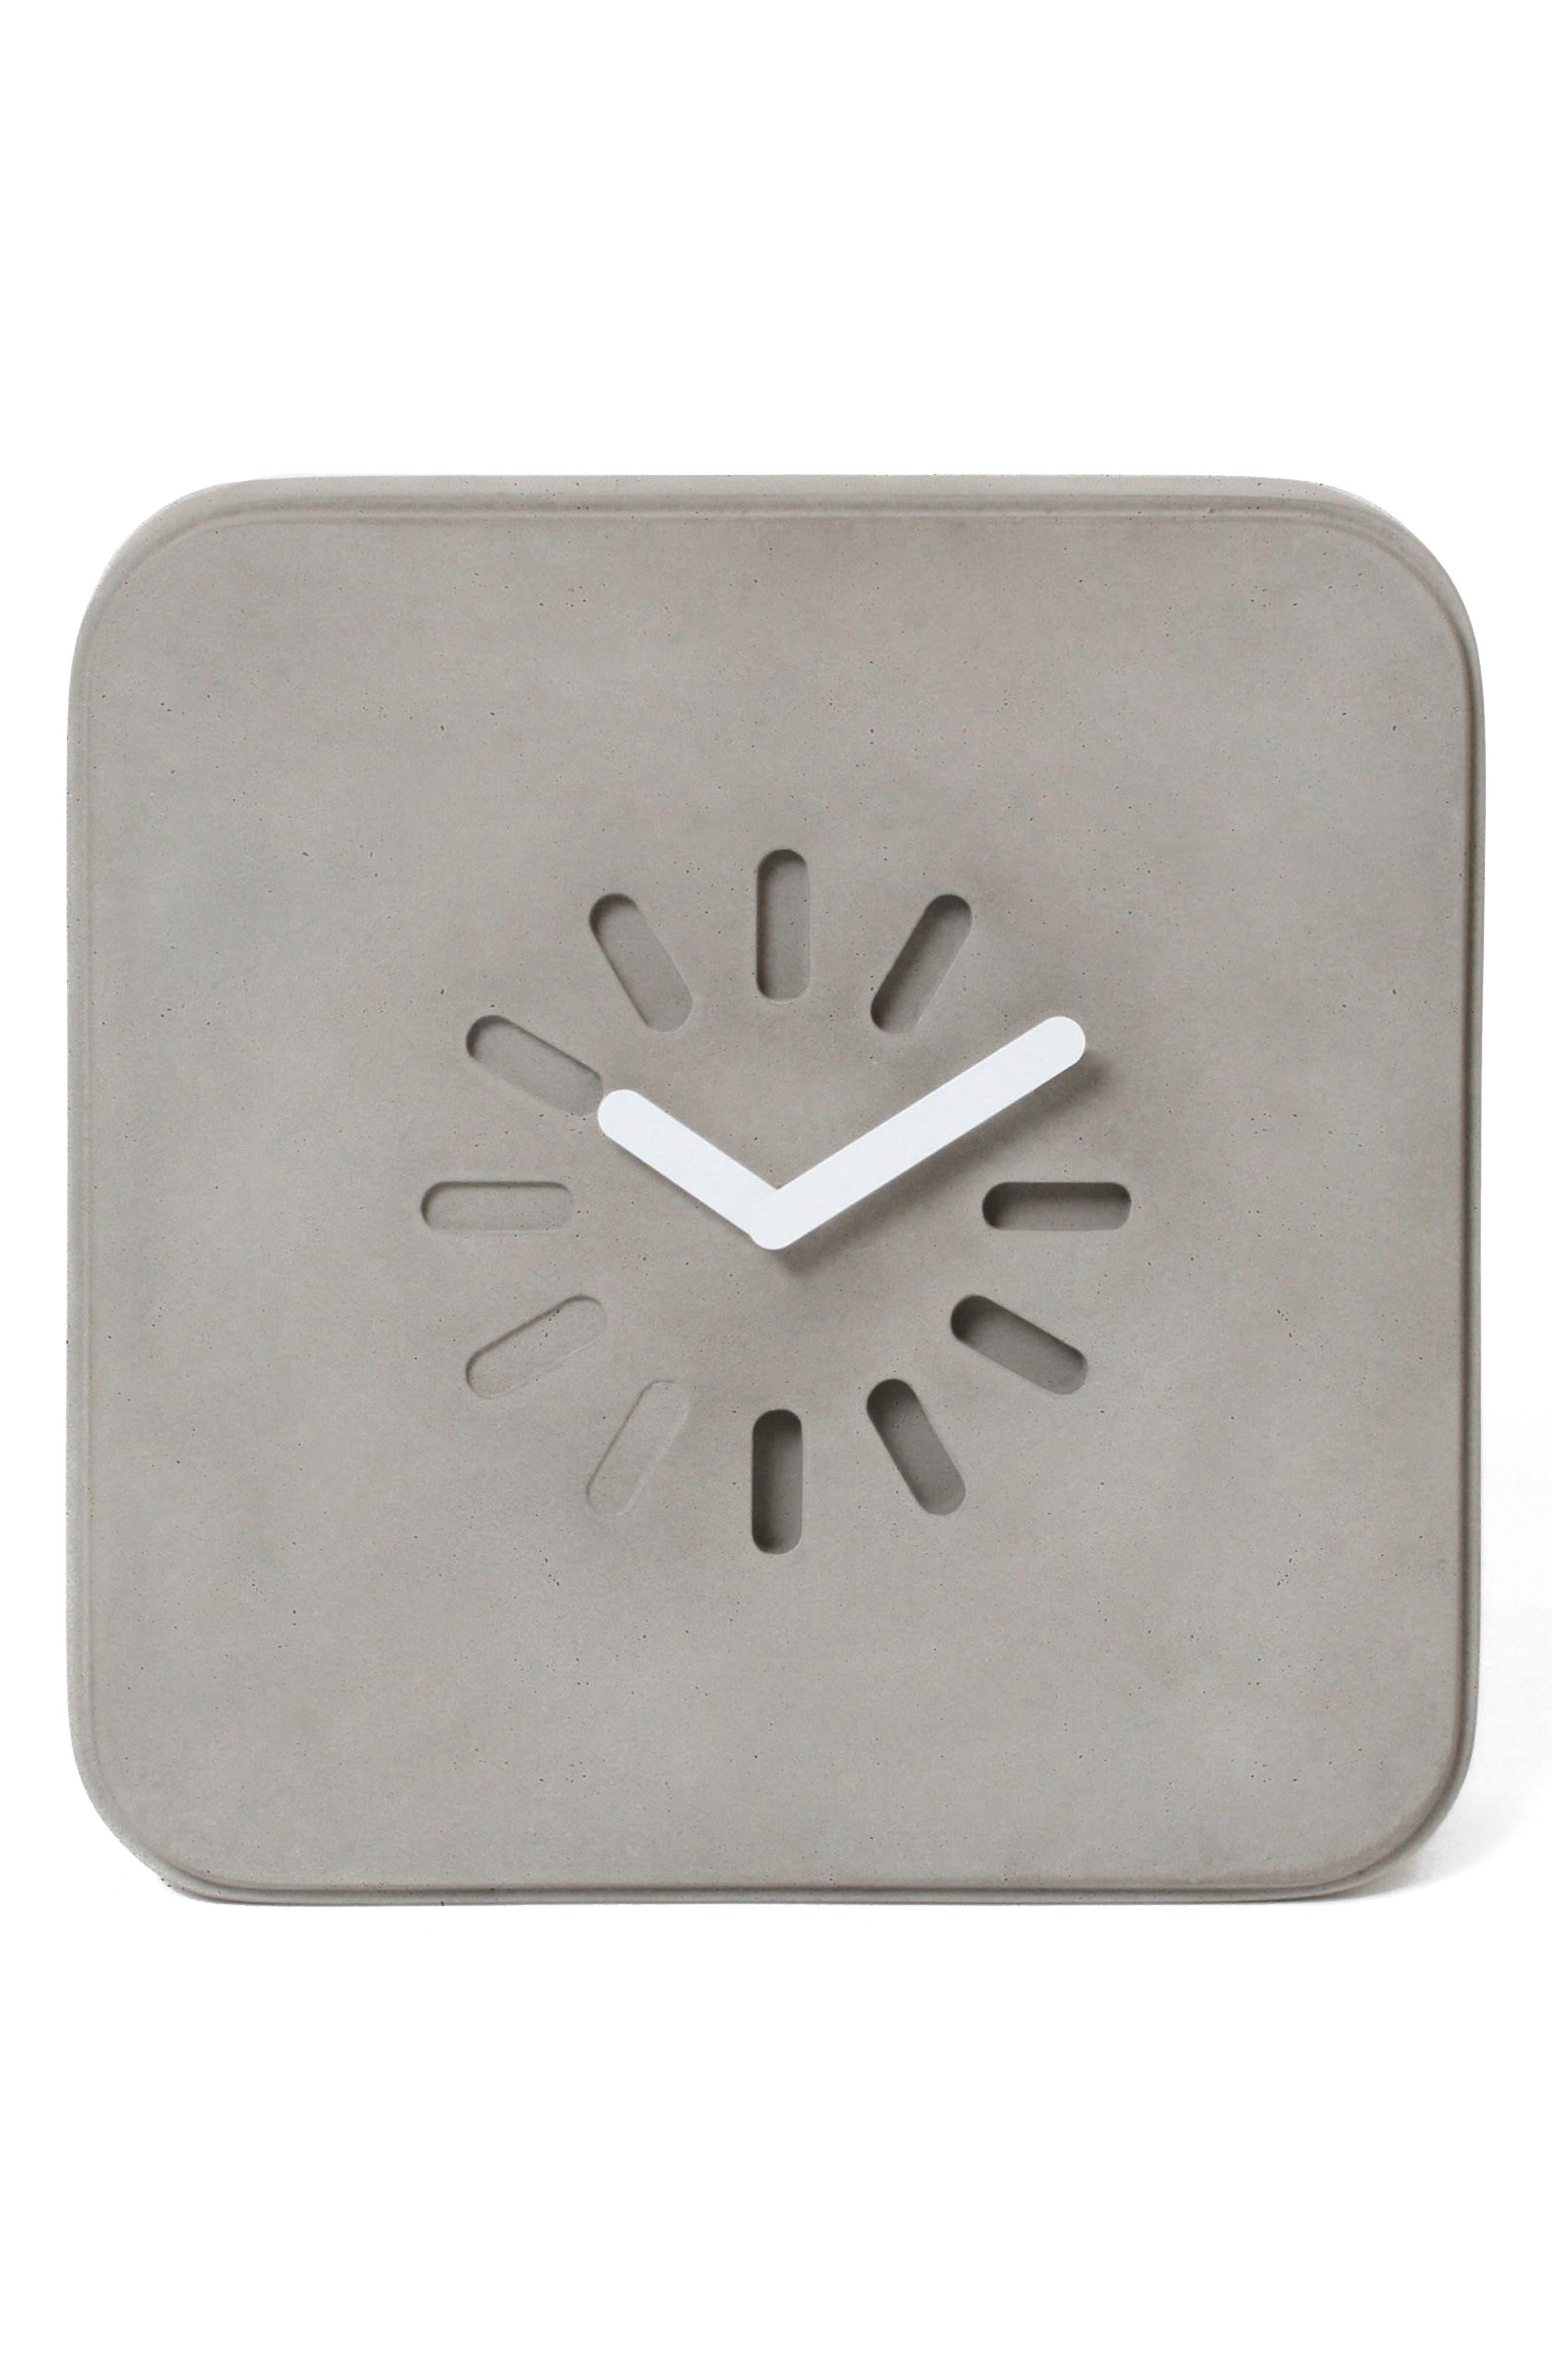 Lyon Béton Life in Progress Clock,                             Main thumbnail 1, color,